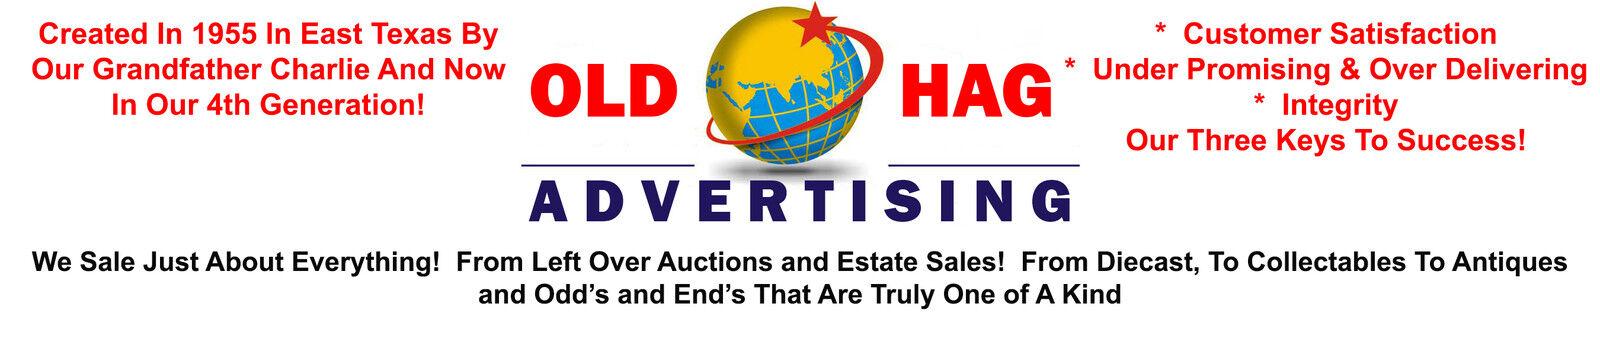 Old Hag Advertising